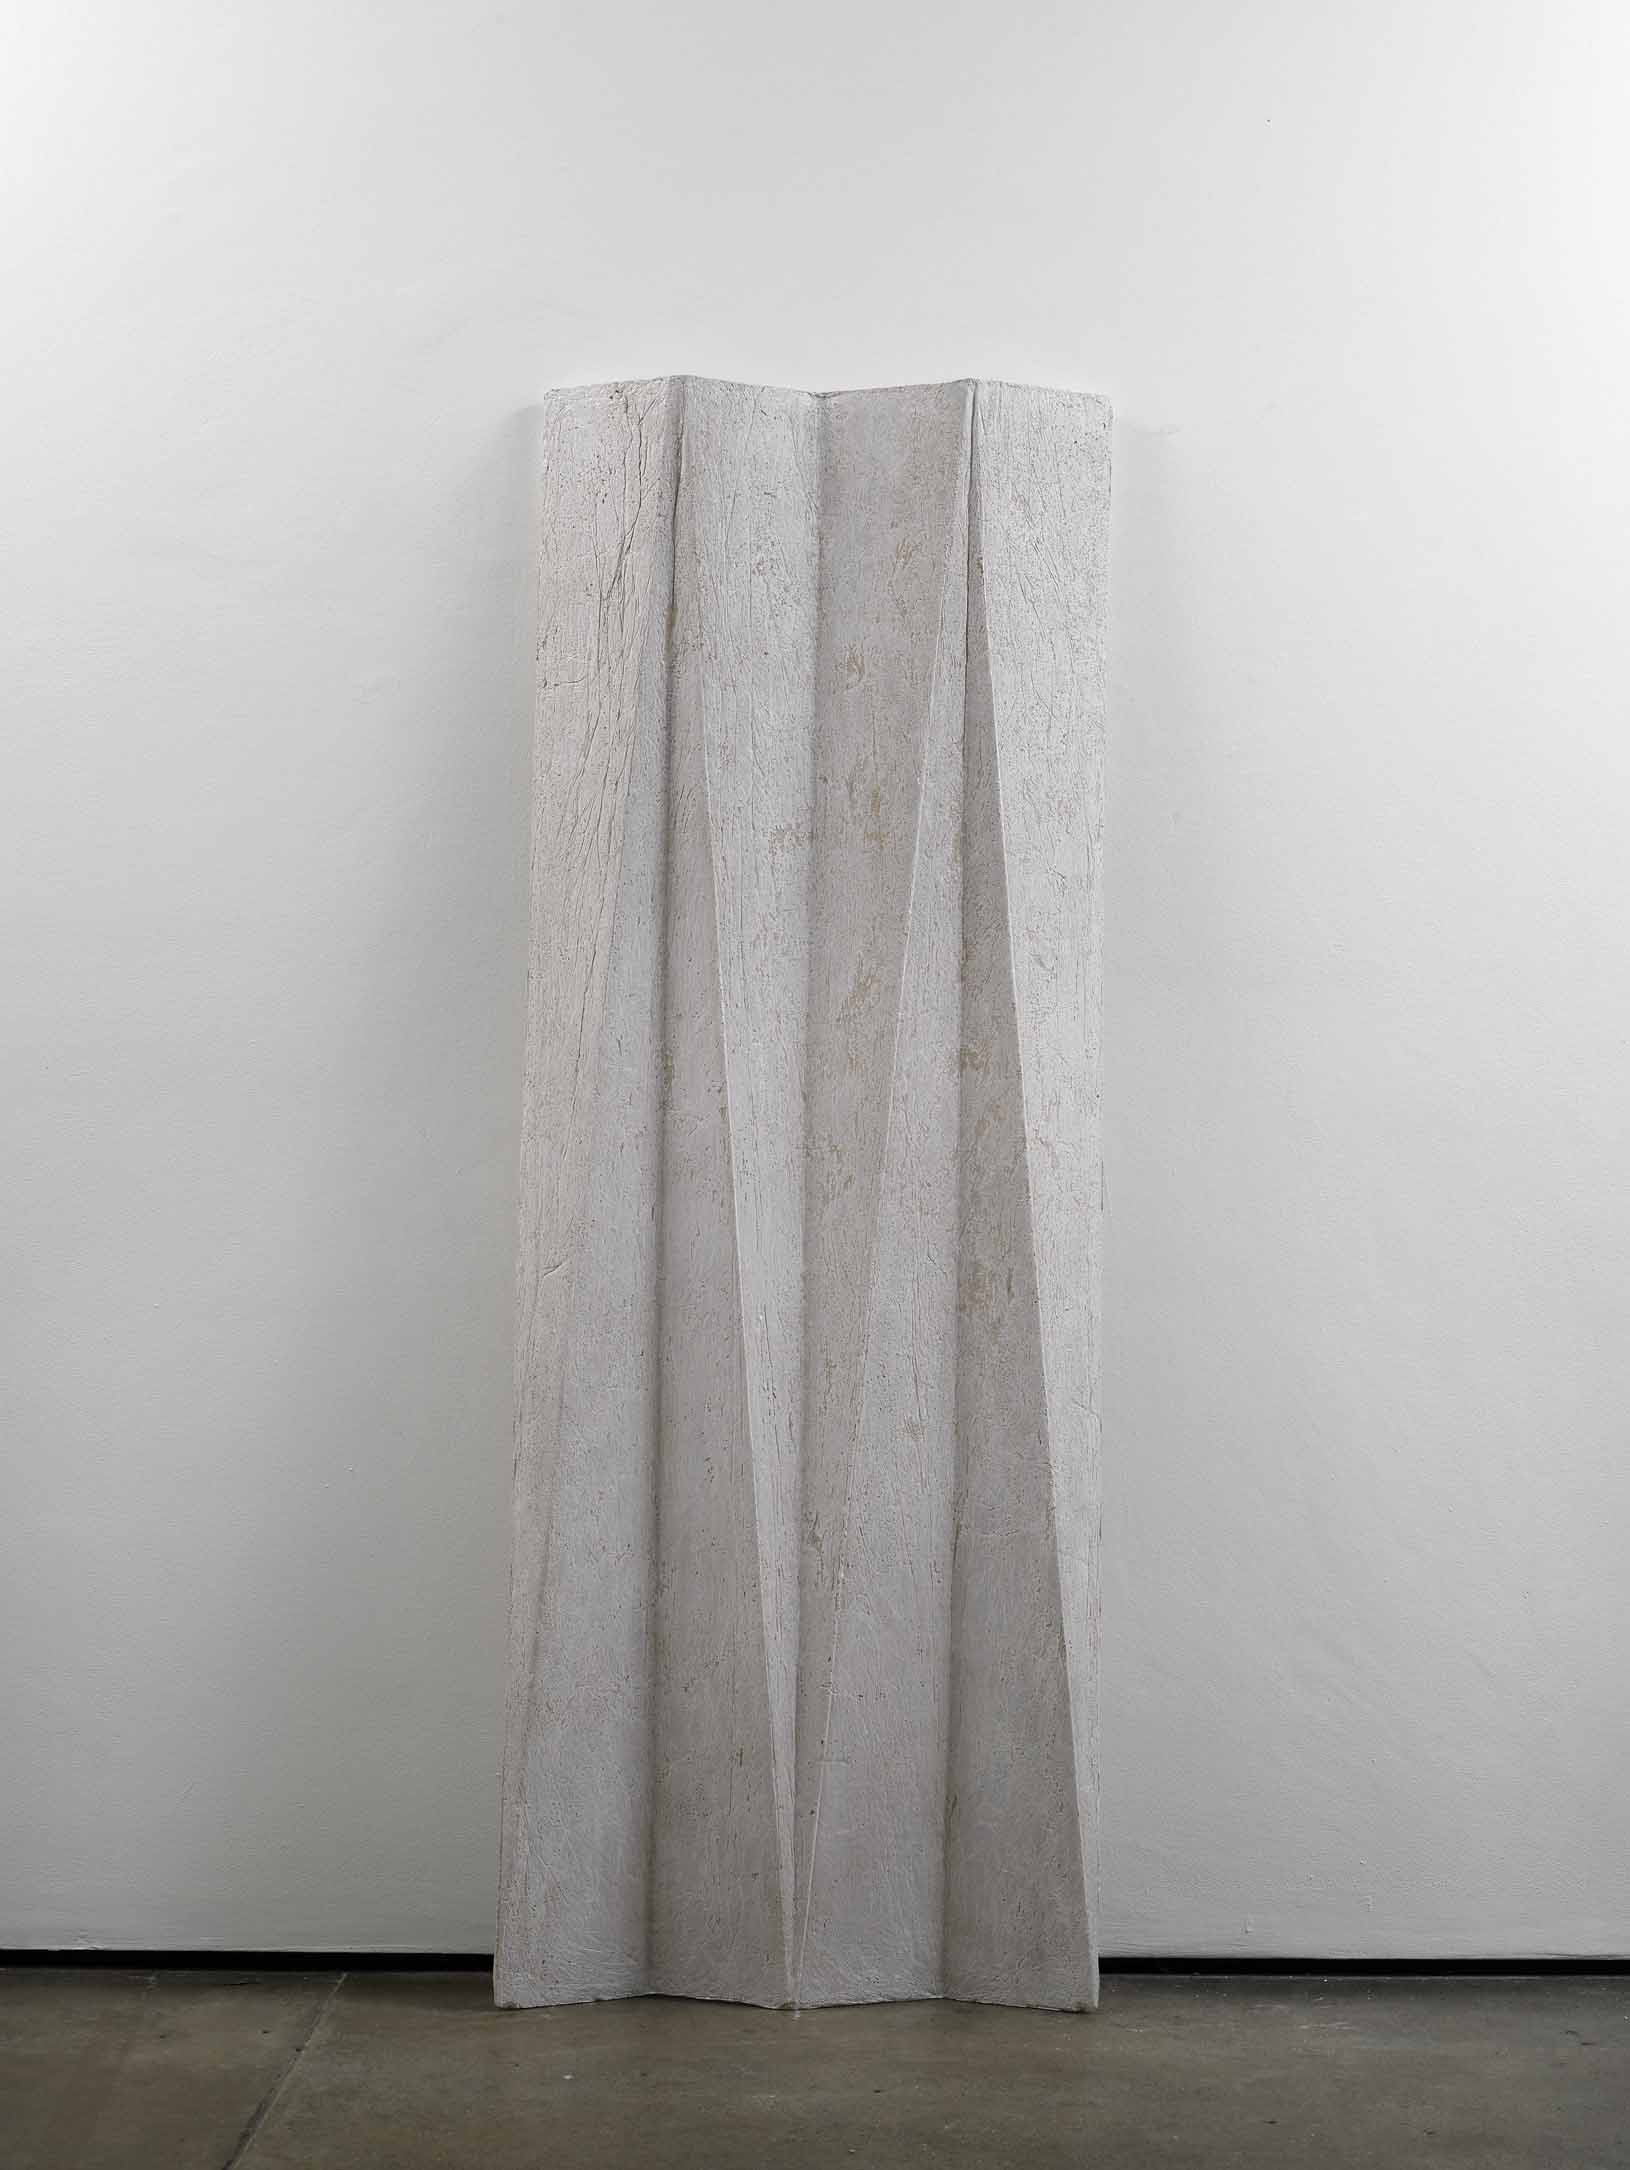 cope (working title)   2011   Concrete   199 x 73 x 11 cm / 78.3 x 28.7 x 4.2 in